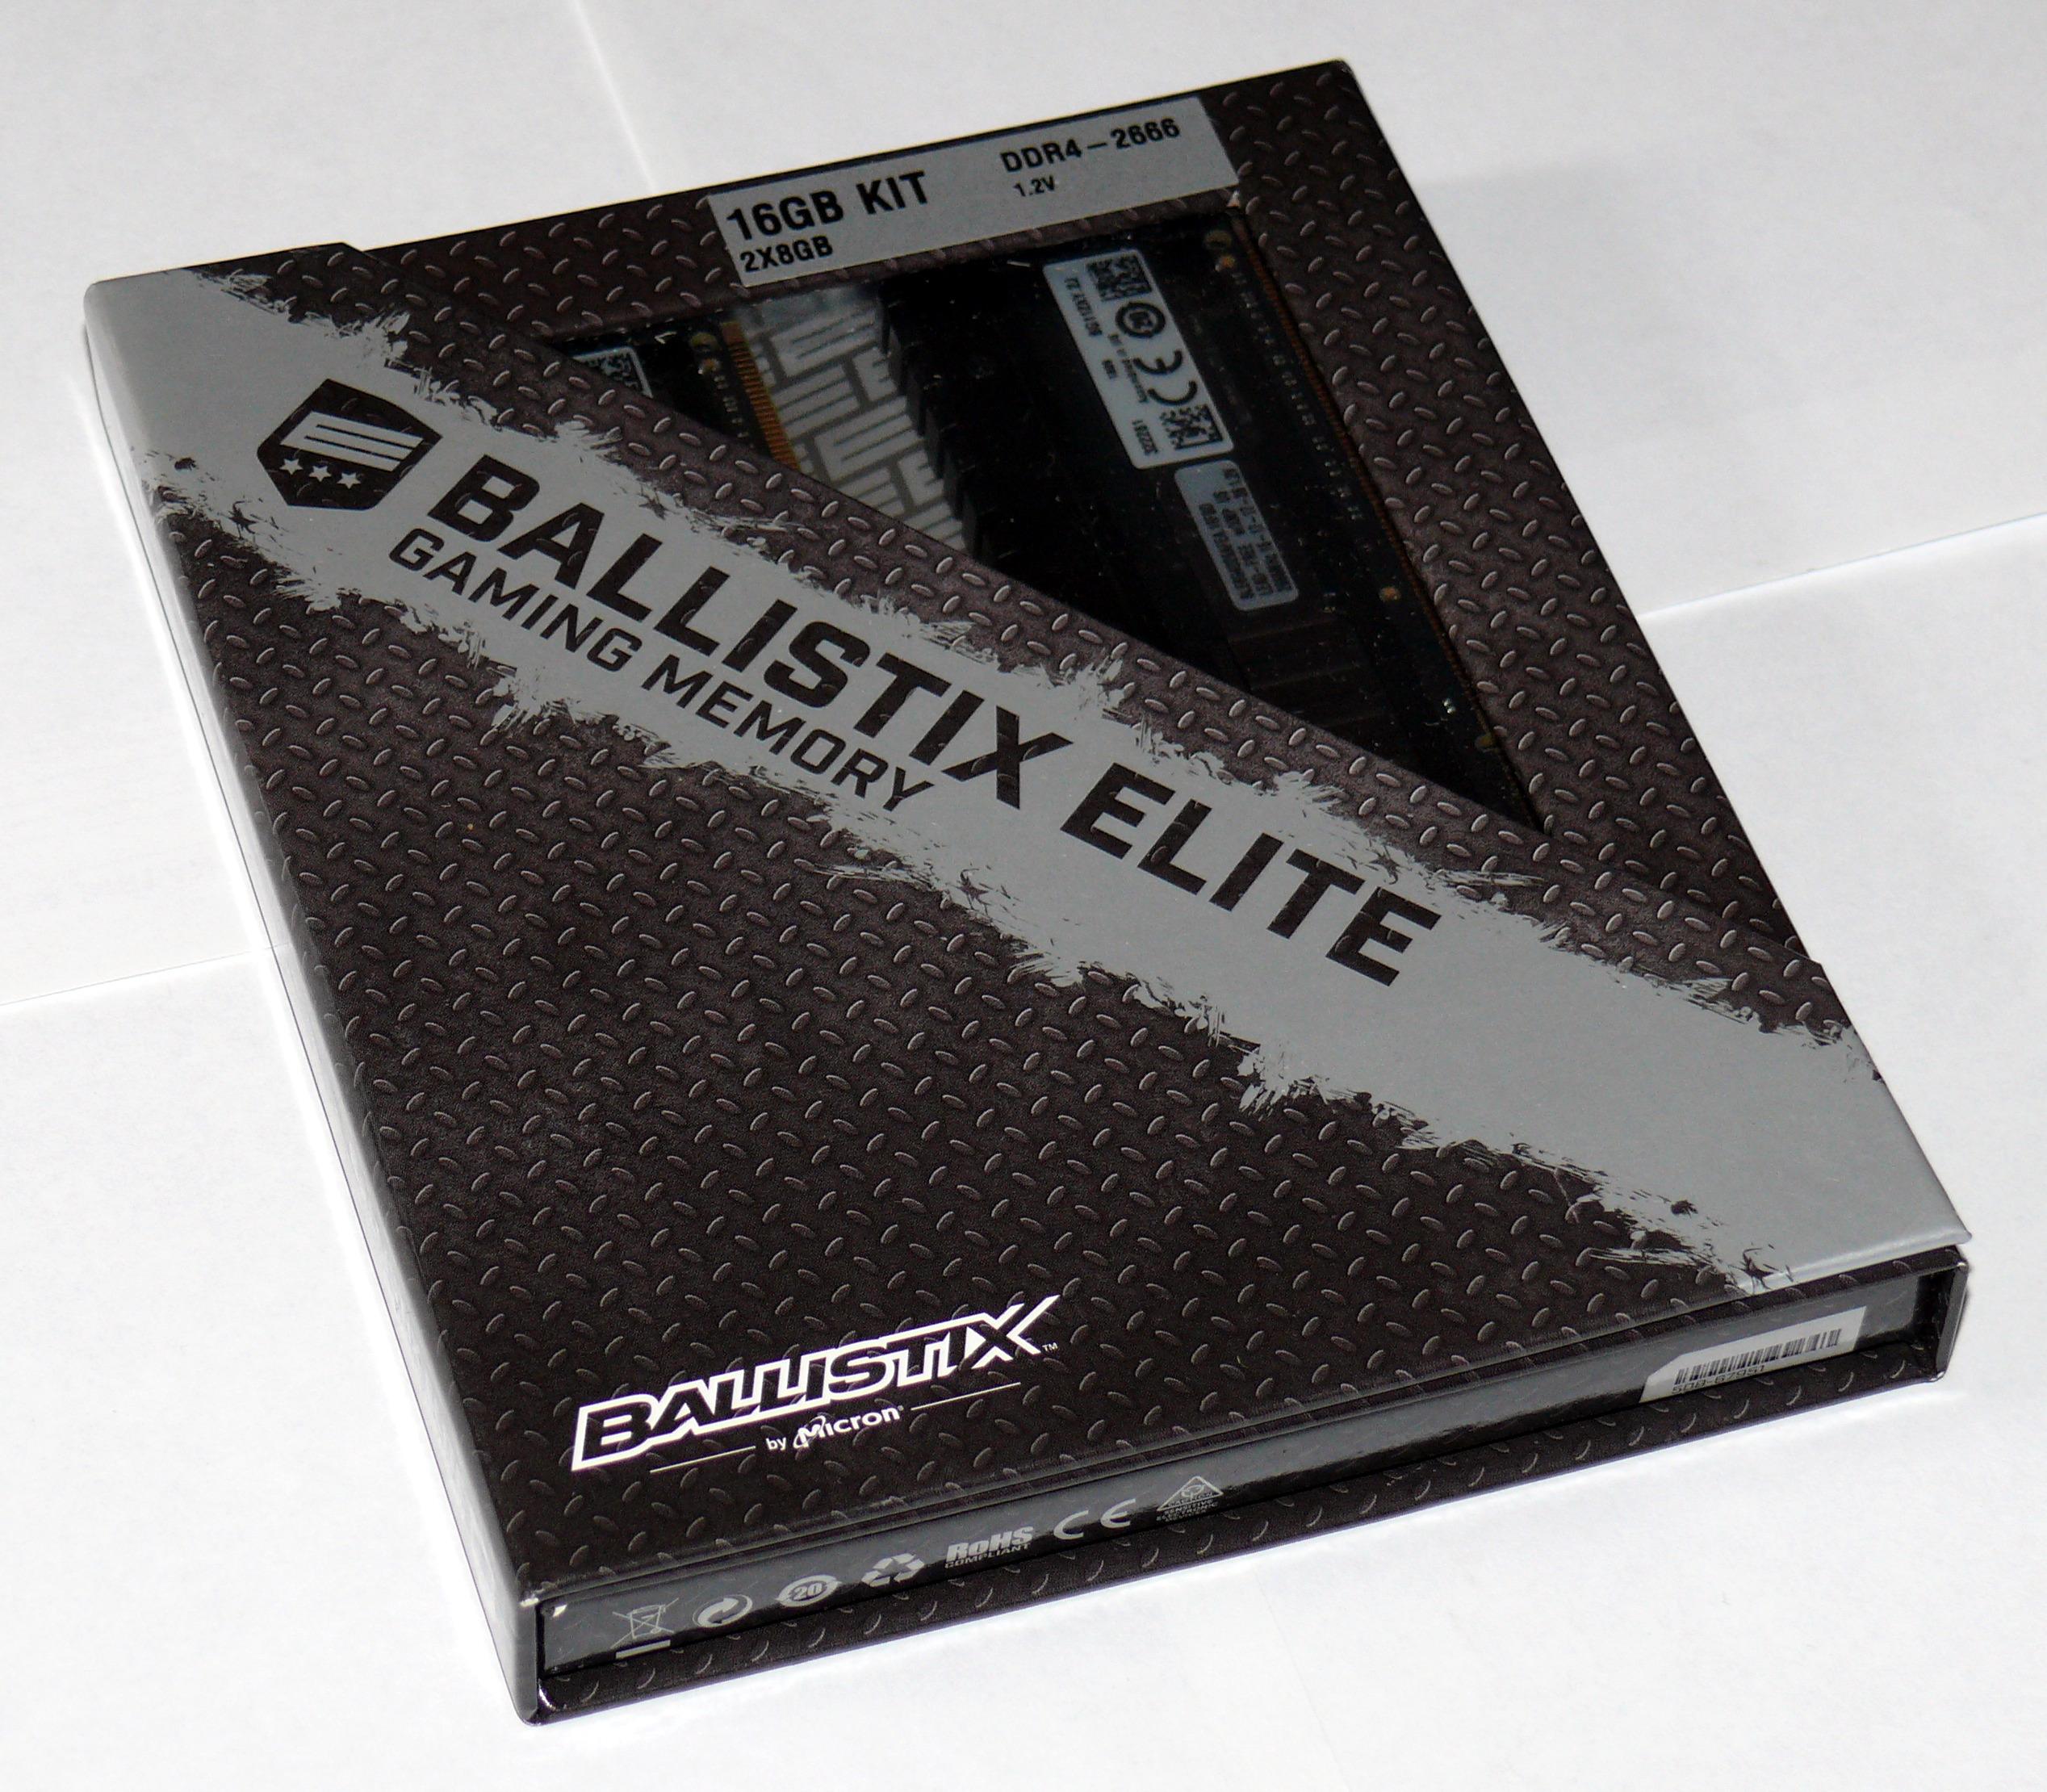 Оперативная память Crucial Ballistix Elite (комплект 2x8GB DDR4-2666